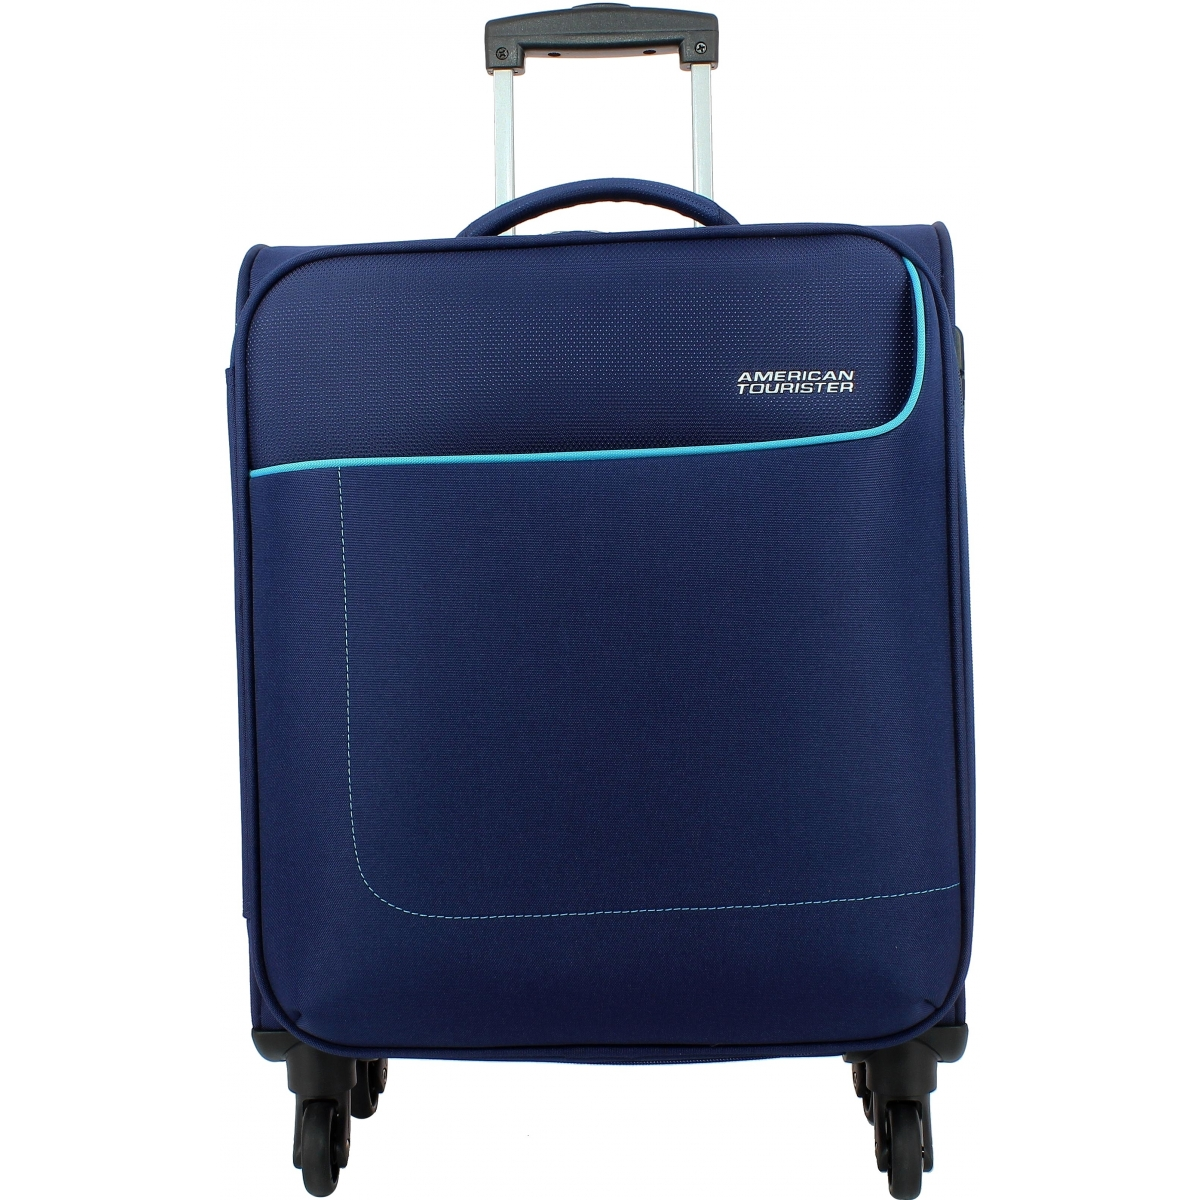 valise cabine american tourister funshine 55cm funshine07 couleur principale orion blue. Black Bedroom Furniture Sets. Home Design Ideas